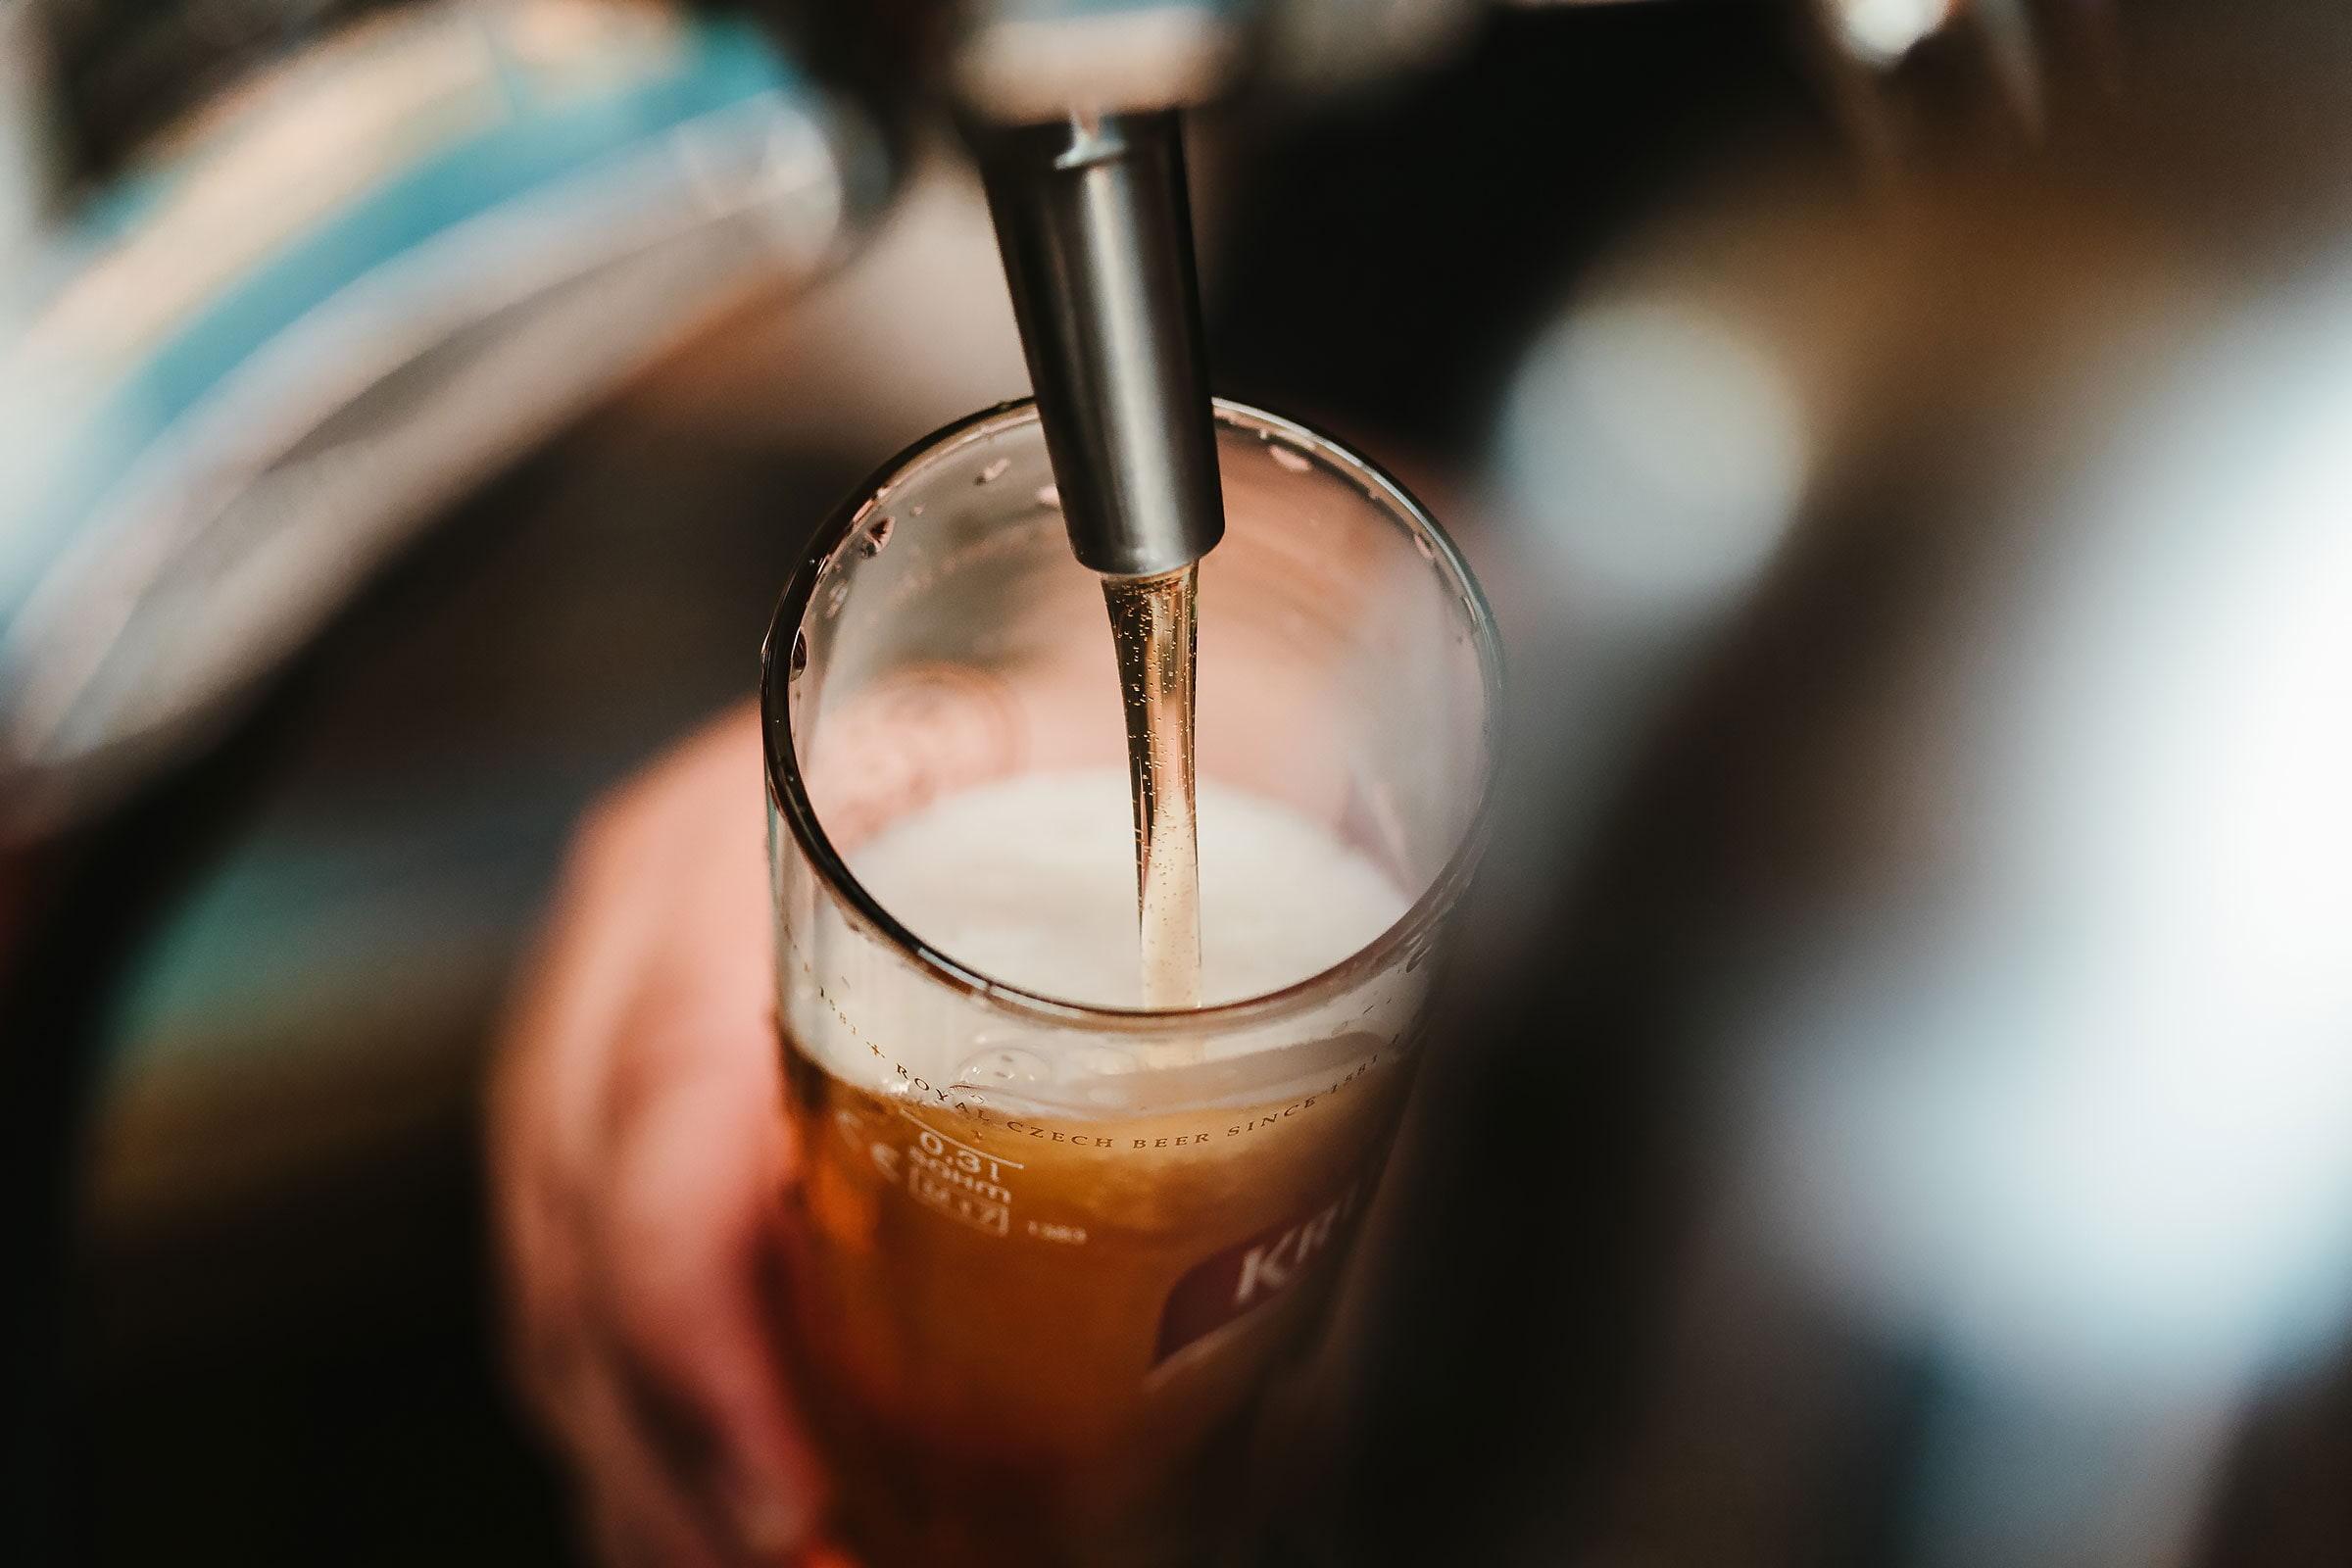 Dugges öppnar baren Pils i Omnipollos gamla lokal